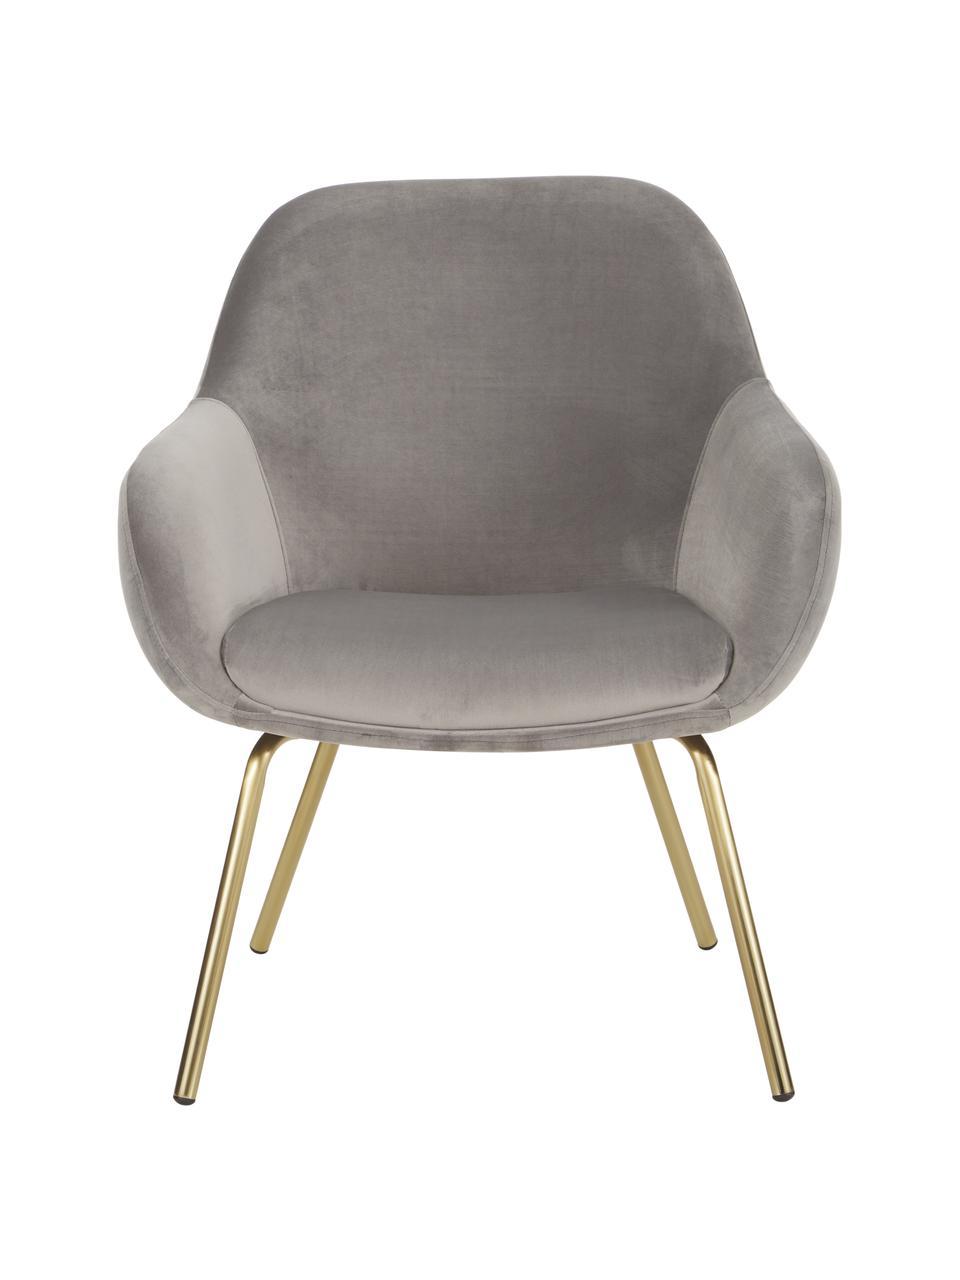 Fluwelen fauteuil Jana, Bekleding: fluweel (polyester), Poten: gelakt metaal, Fluweel grijs, B 72 x D 68 cm